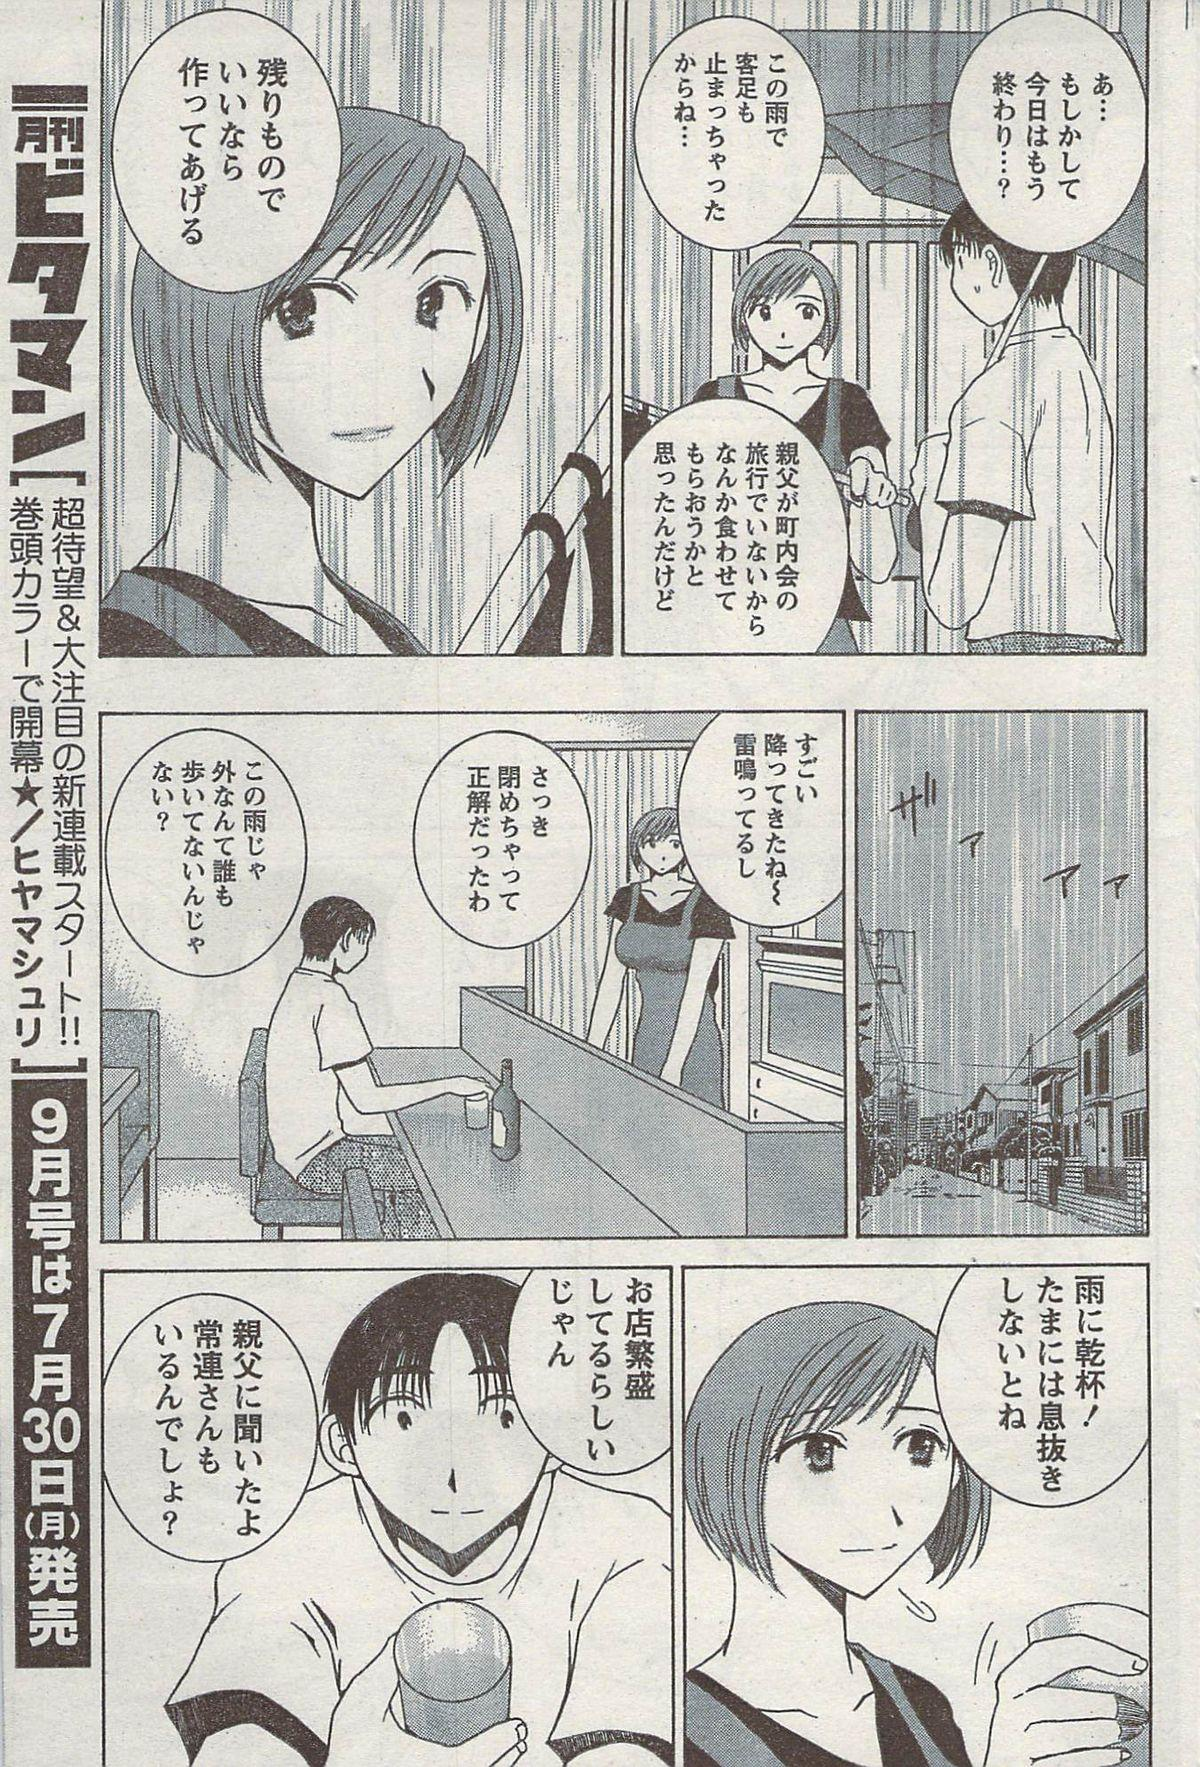 Monthly Vitaman 2007-08 98